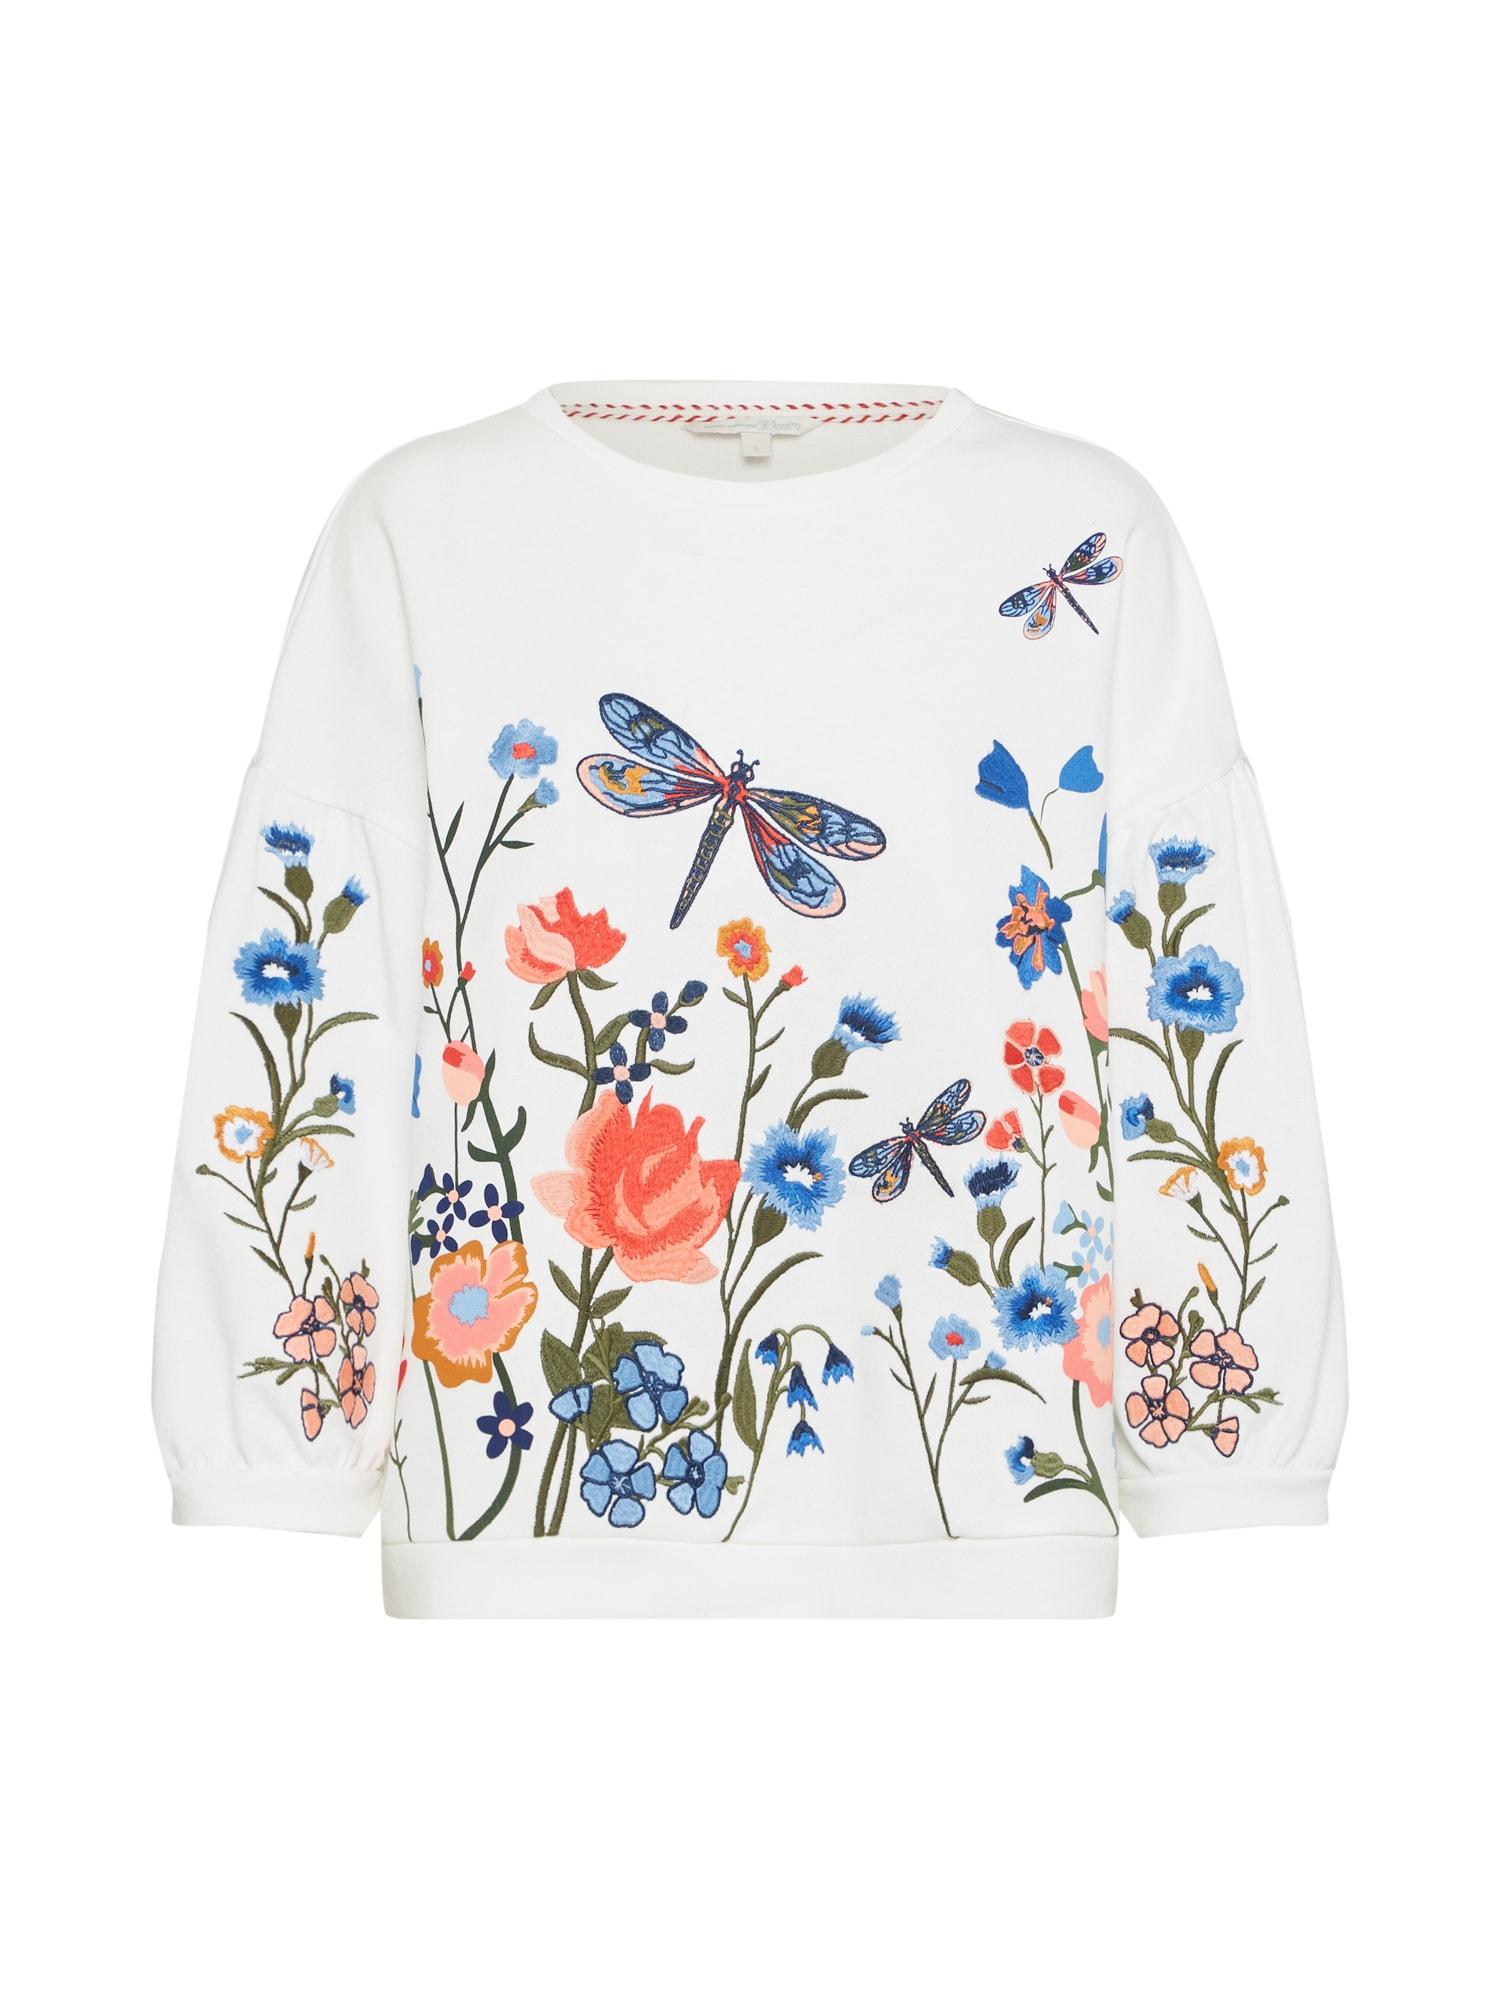 TOM TAILOR DENIM, Dames Sweatshirt, gemengde kleuren / offwhite